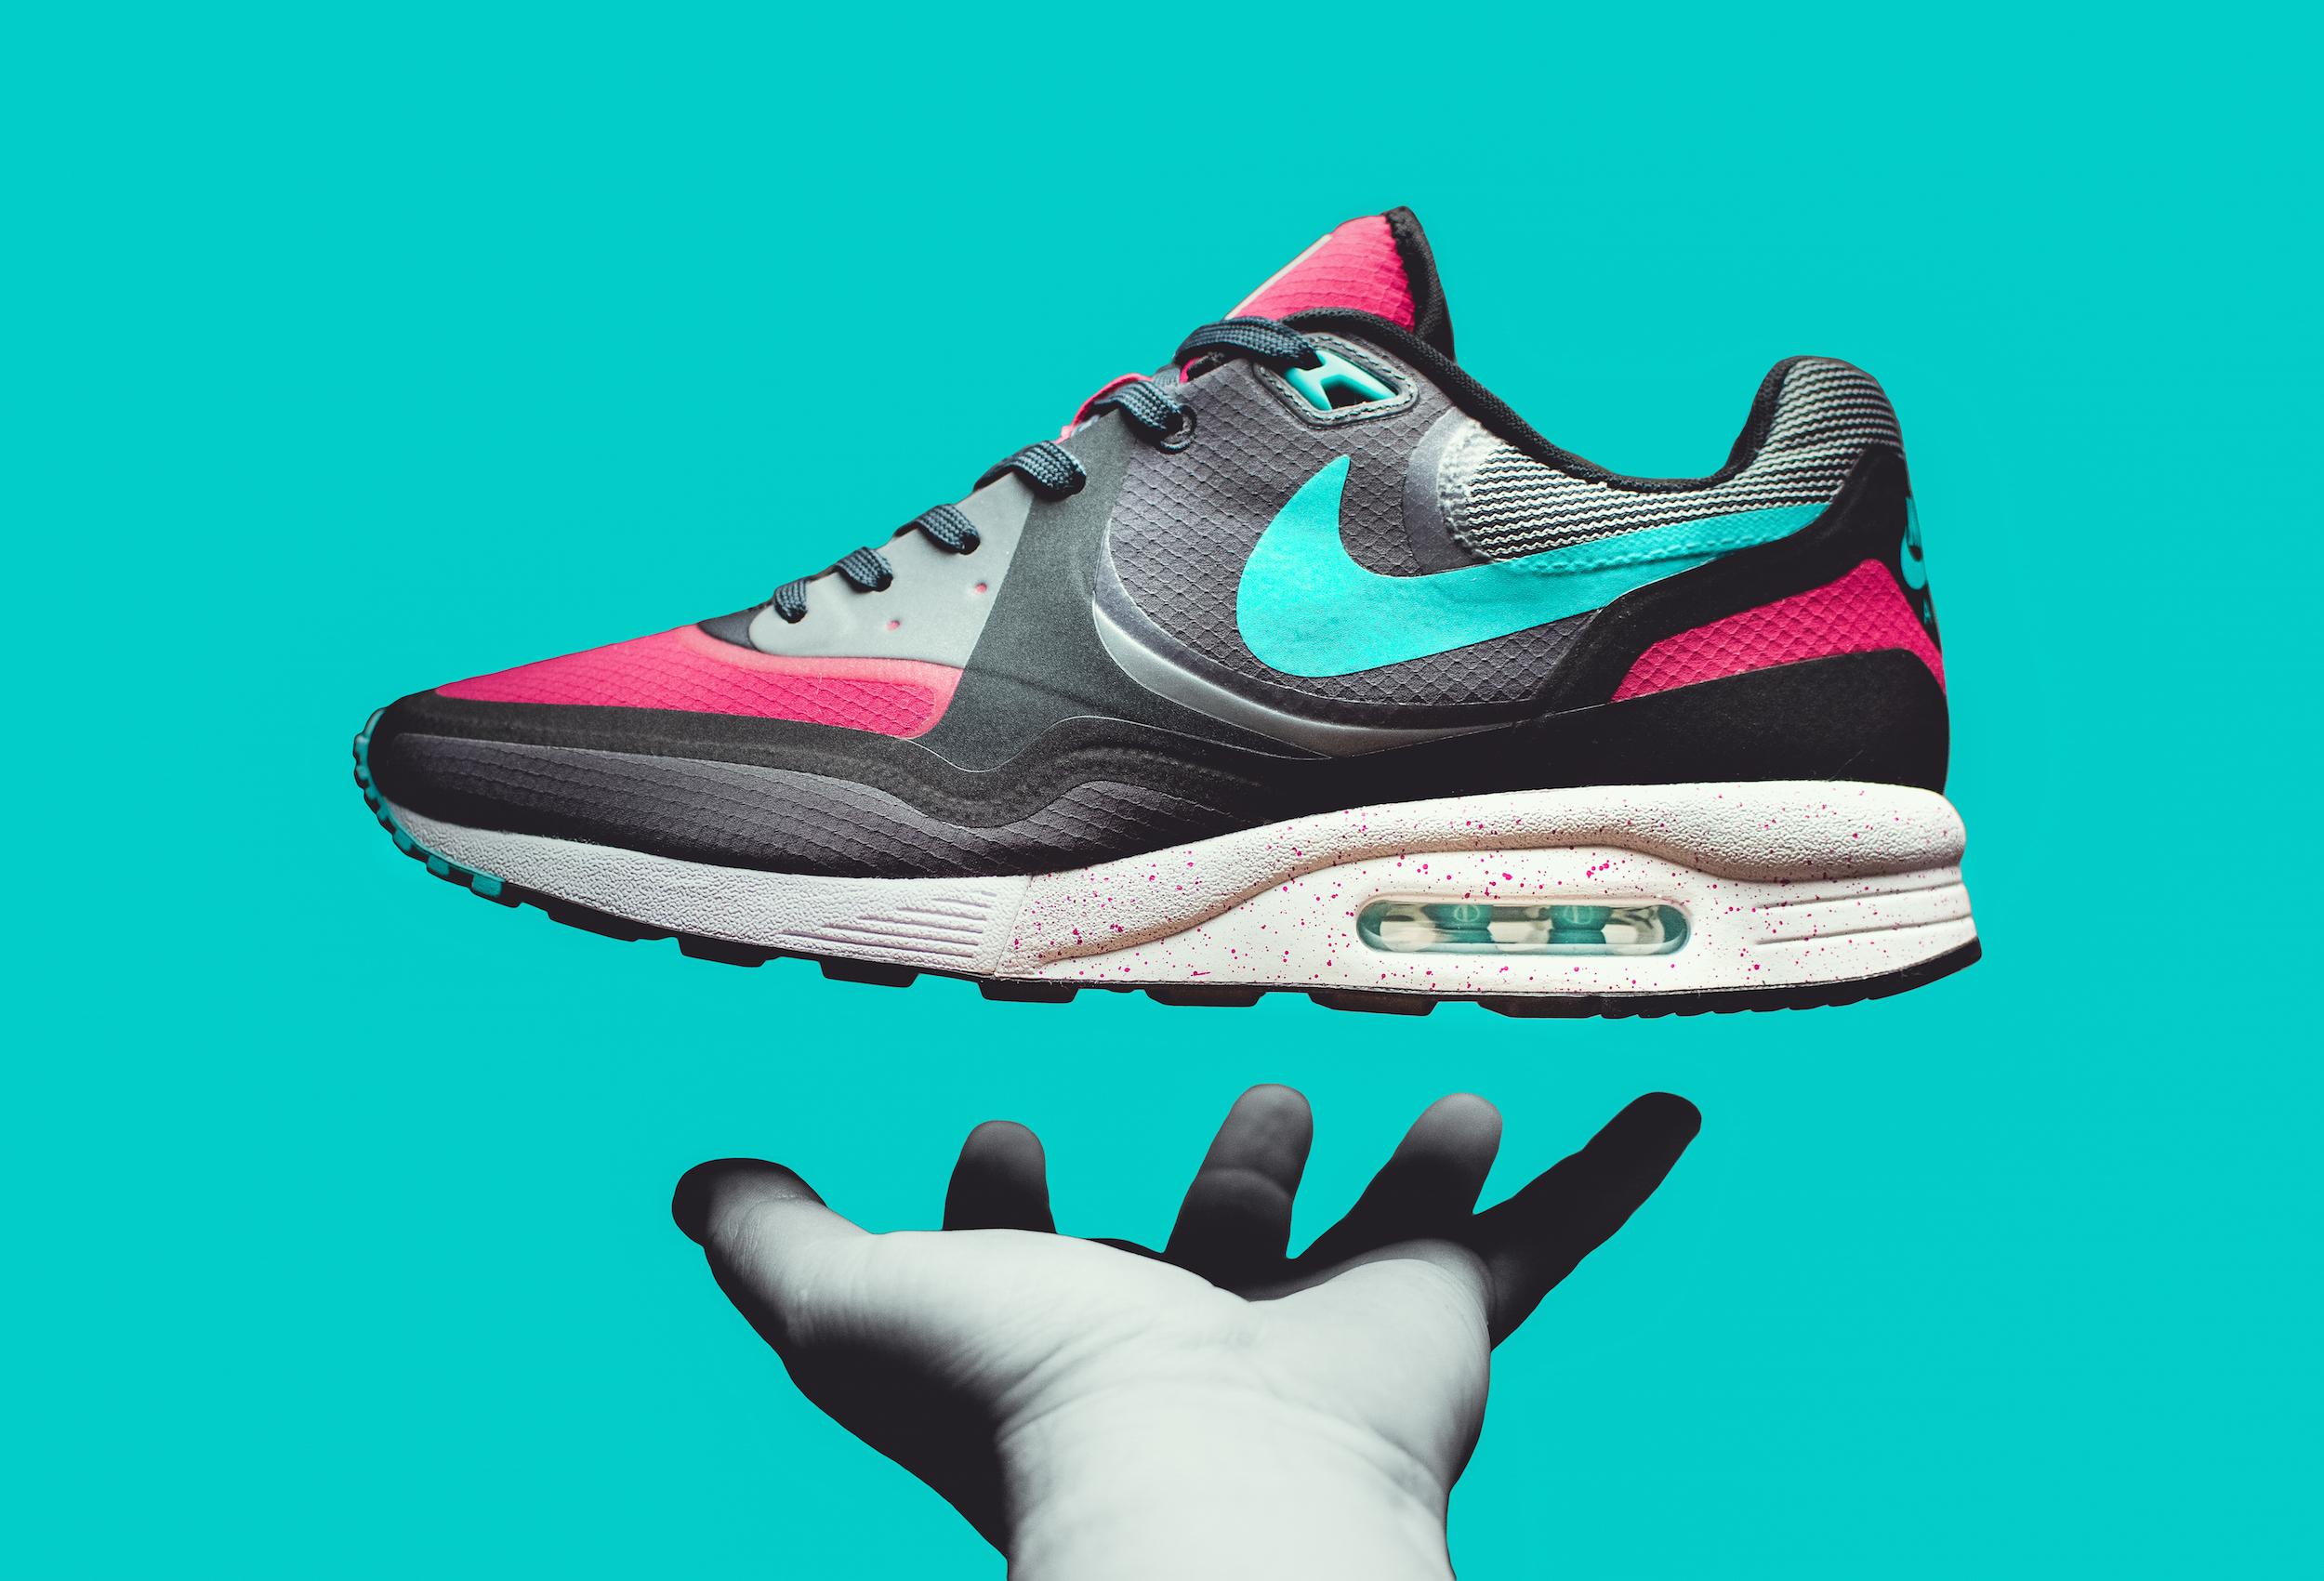 Nike Herren Air Max Plus B07BDYR7Z7 Atmungsaktive Schuhe